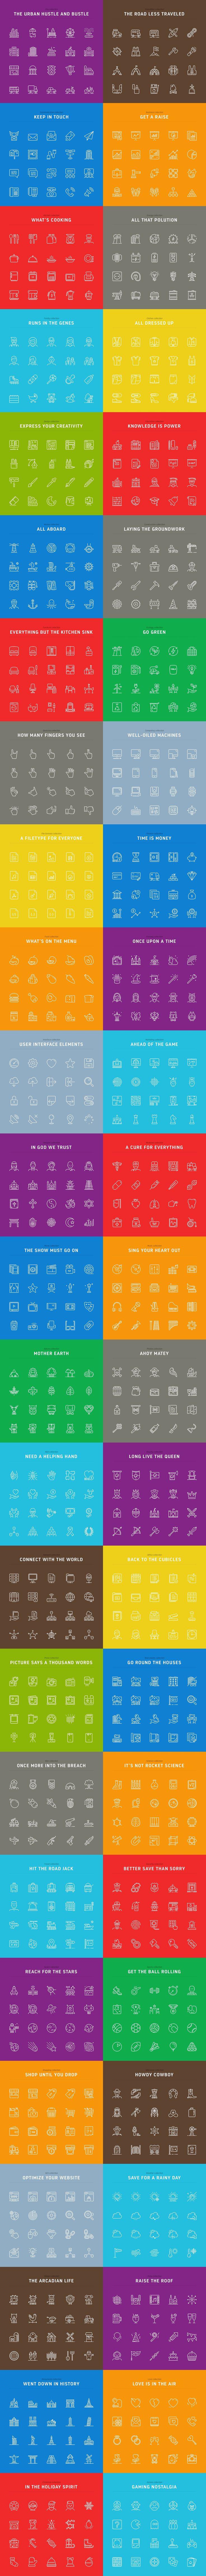 LineKing iOS Icons - Icons - 2